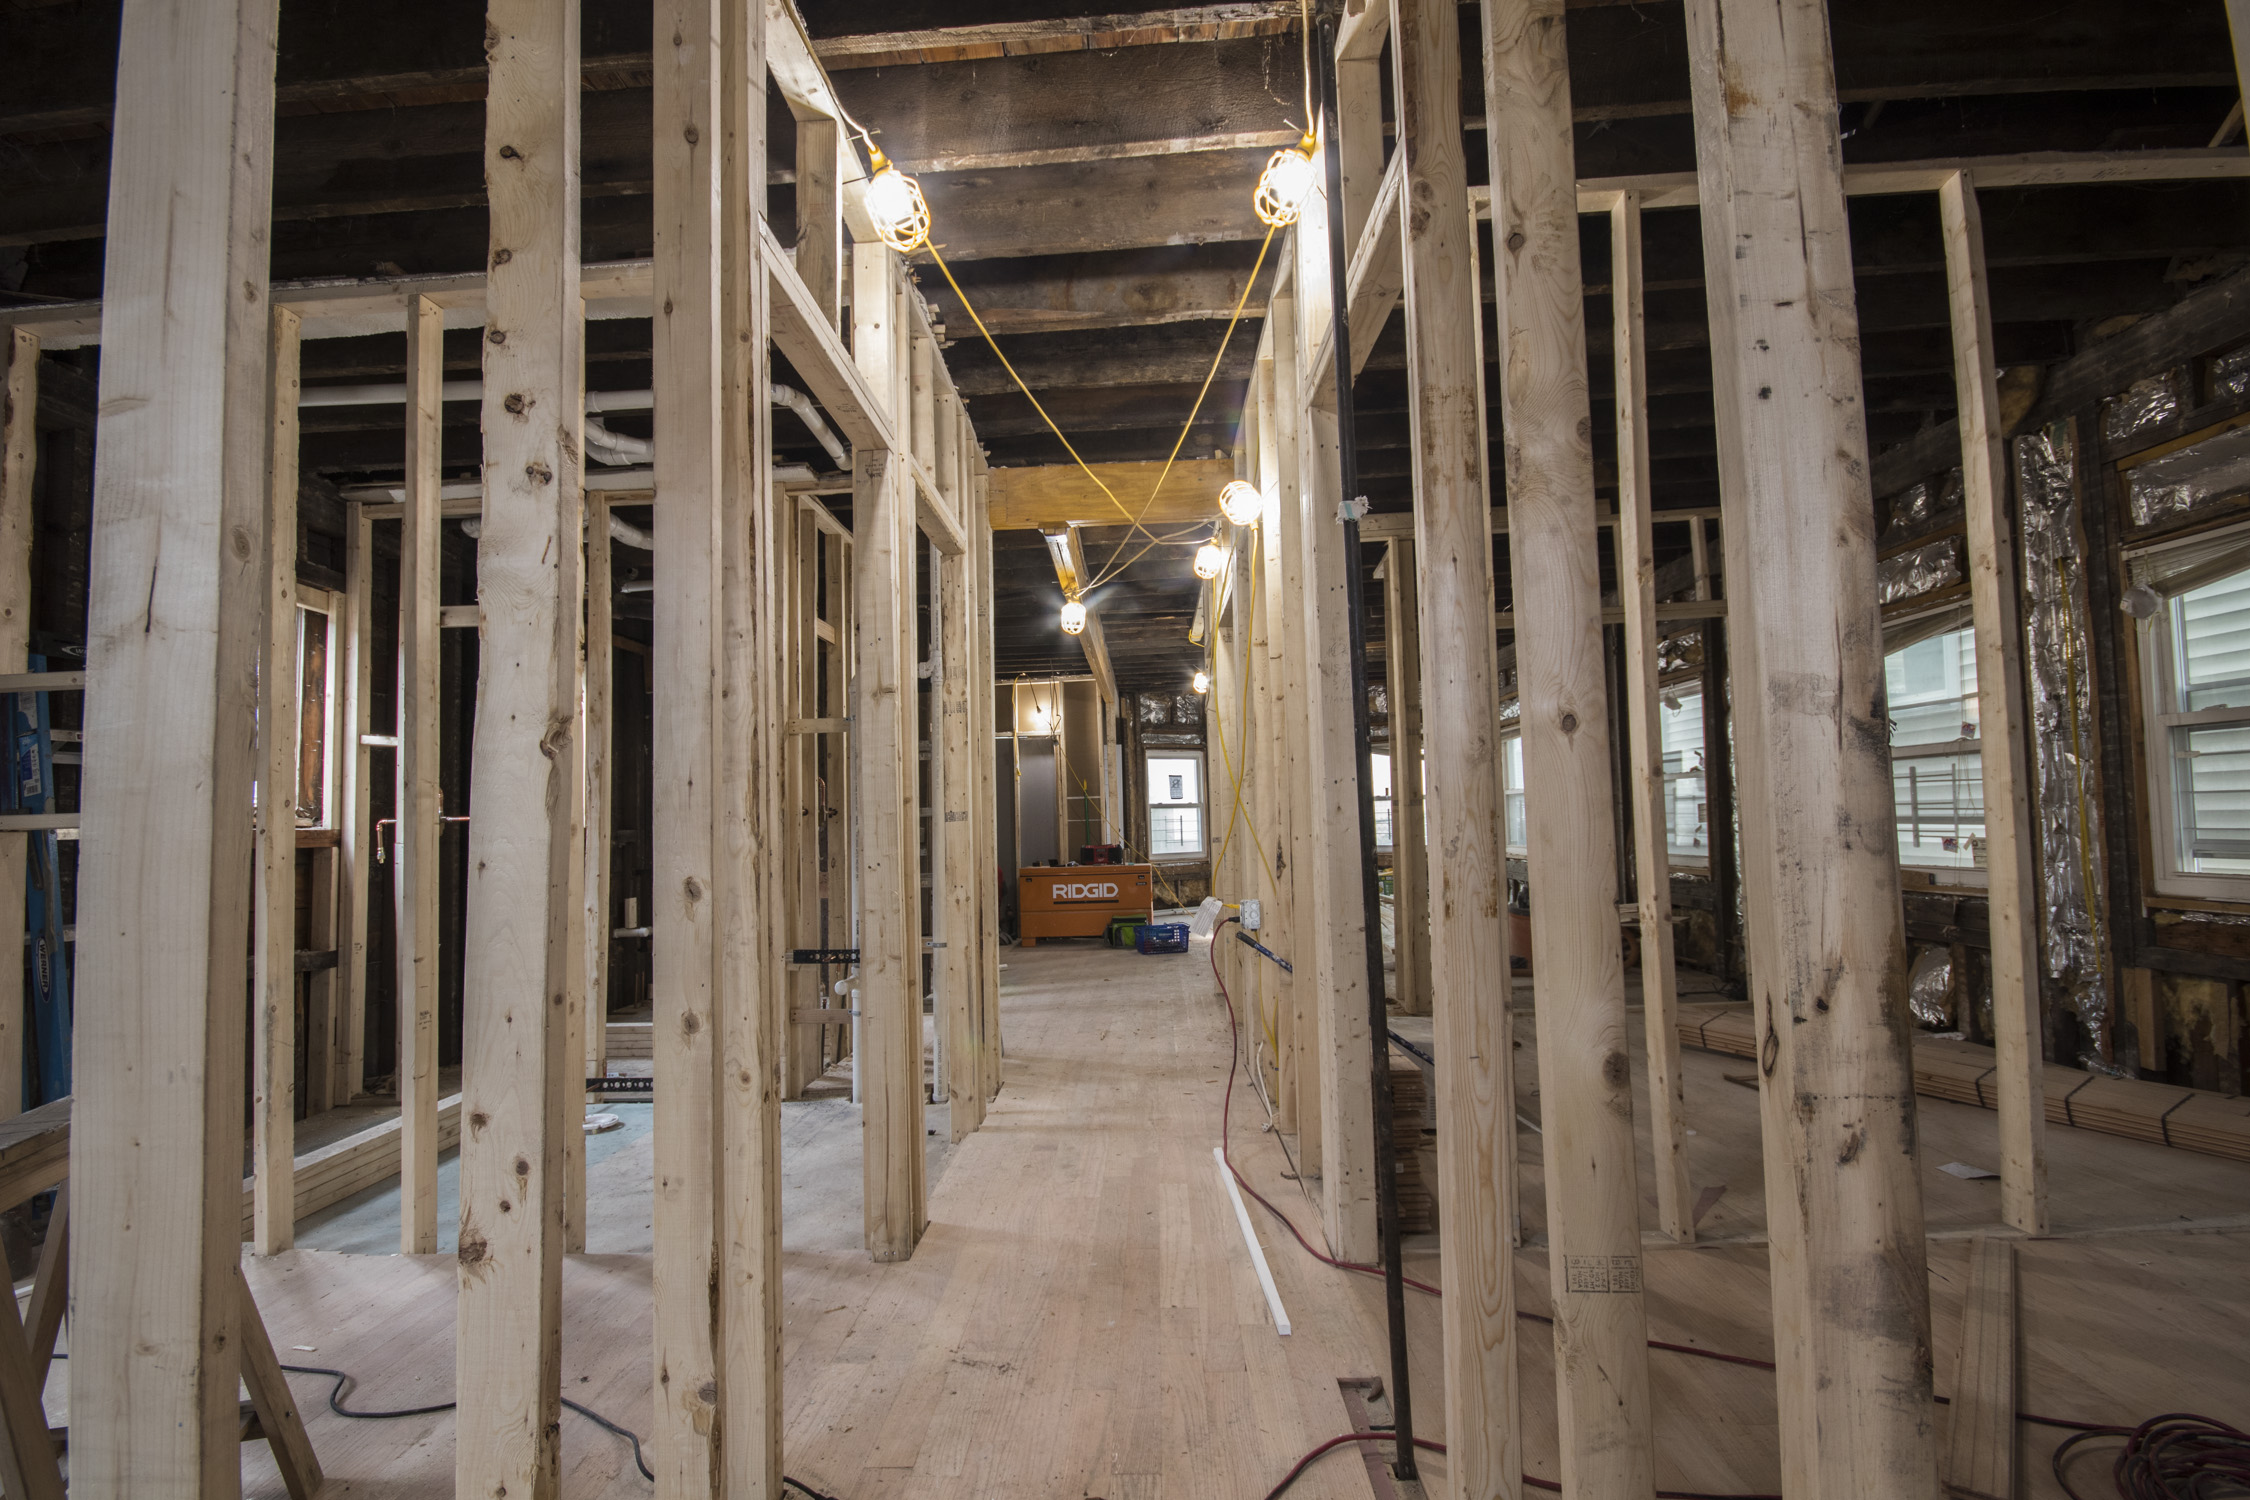 25 darling street homer enovation boston general contractors_64